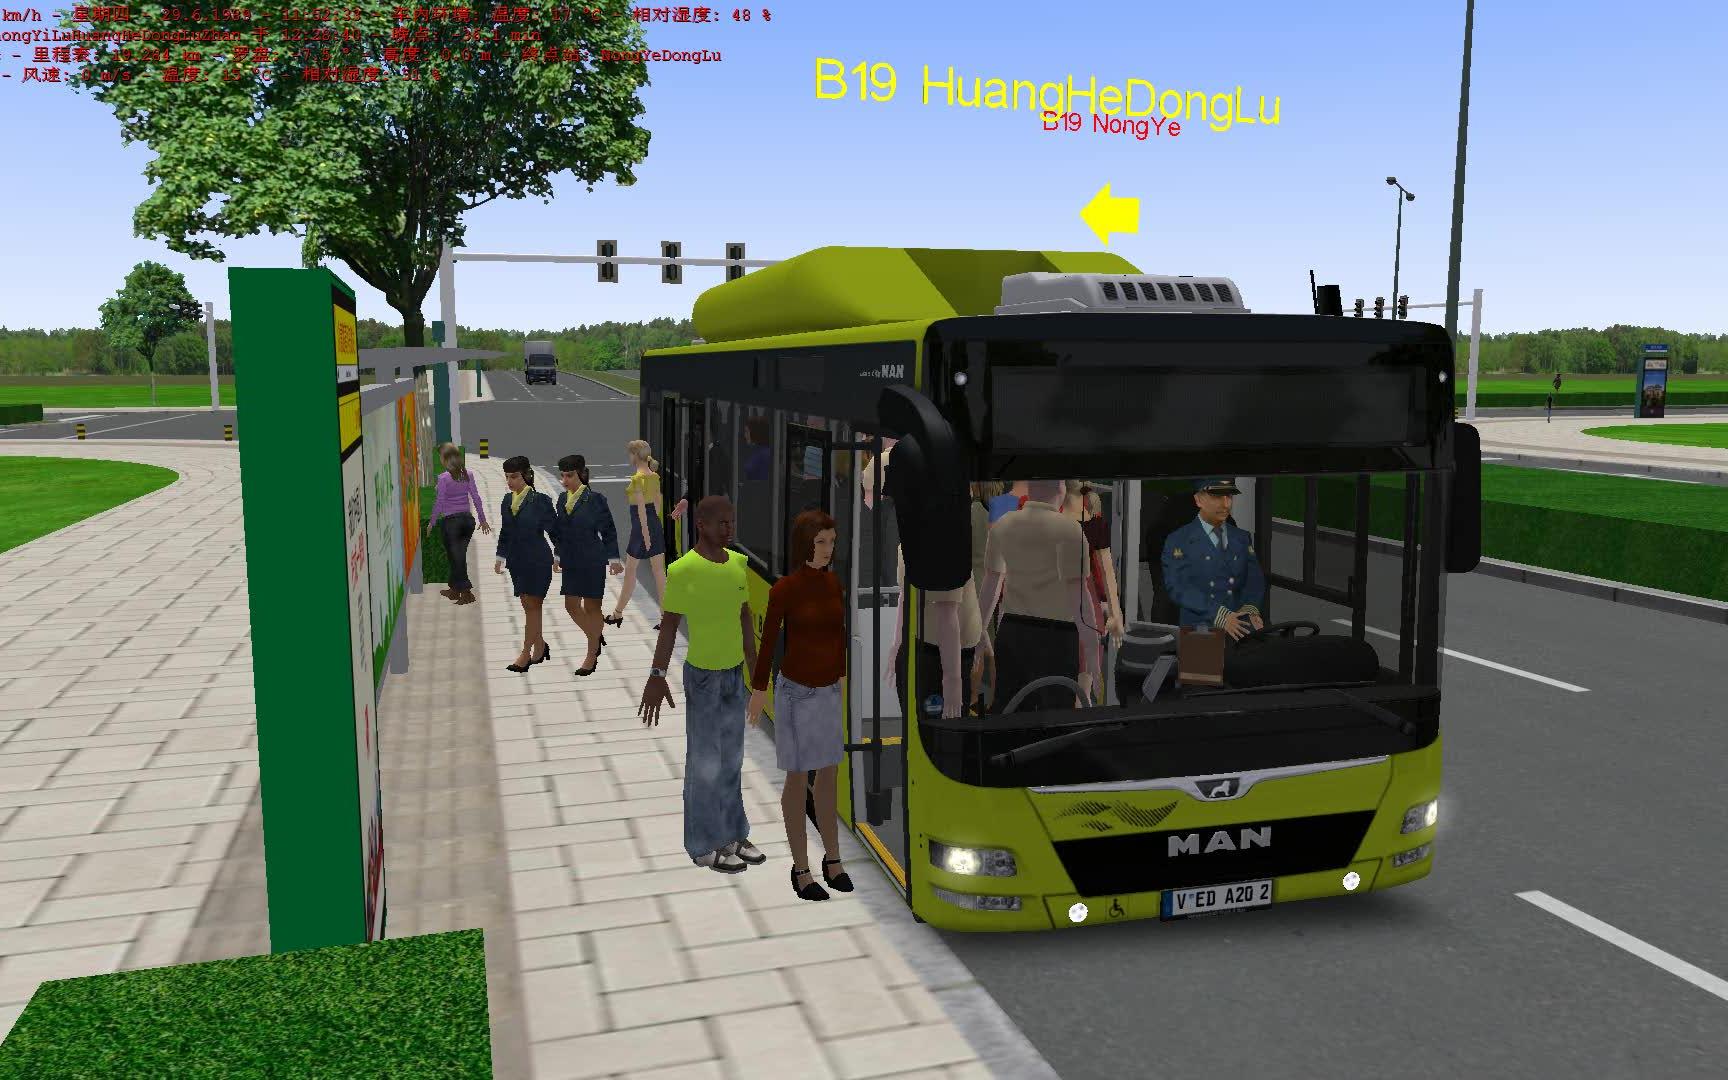 Omsi巴士模拟-郑州B19公交线路(MAN巴士)【幸福】